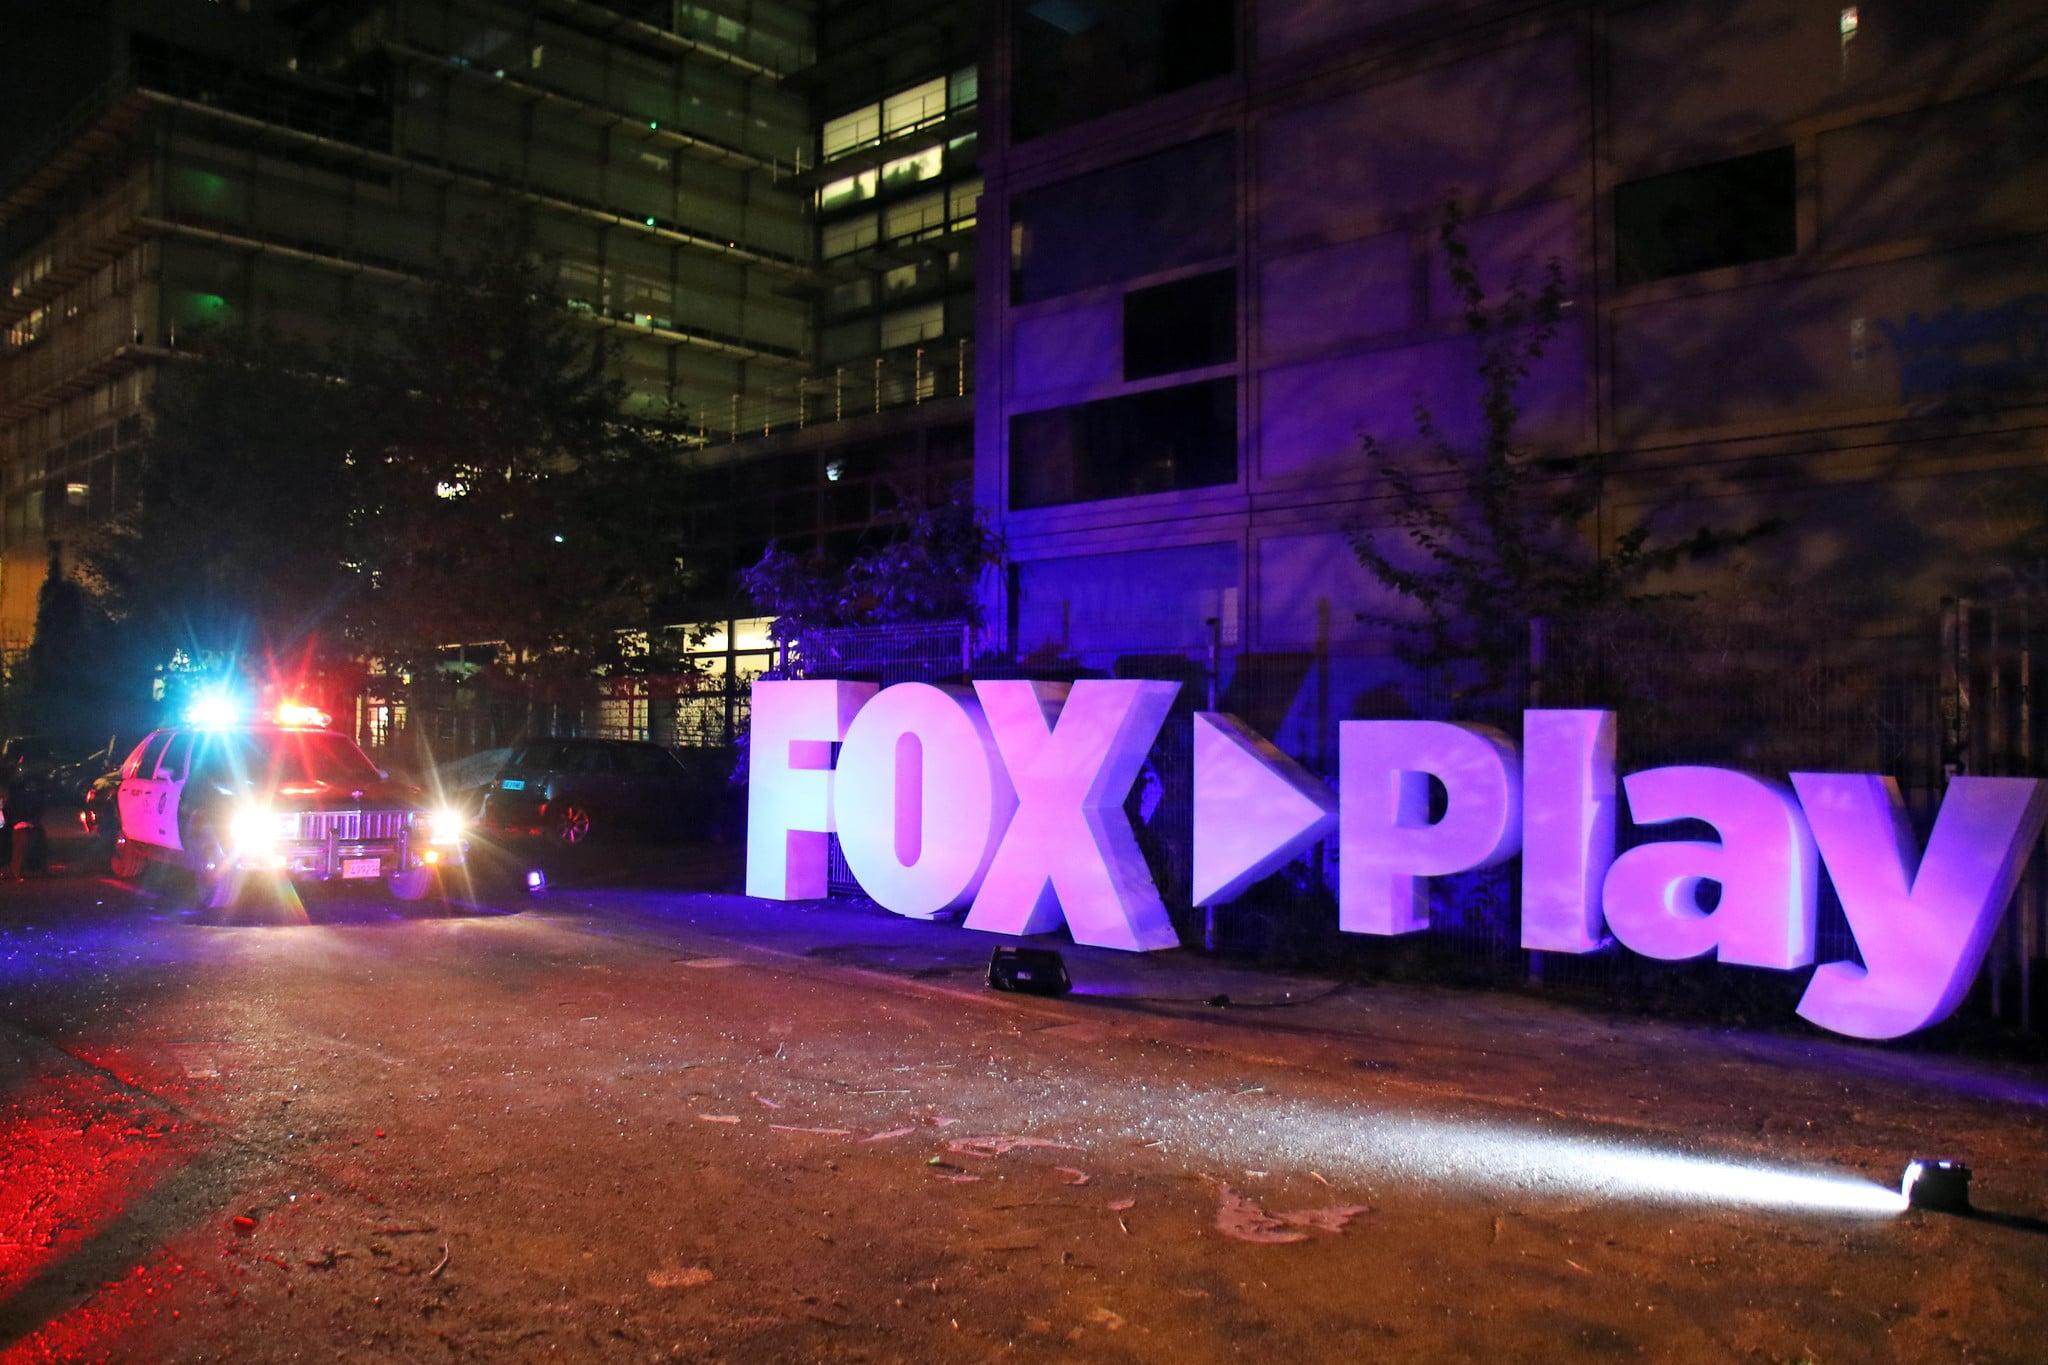 FOX Play launch : Let's Fox Play